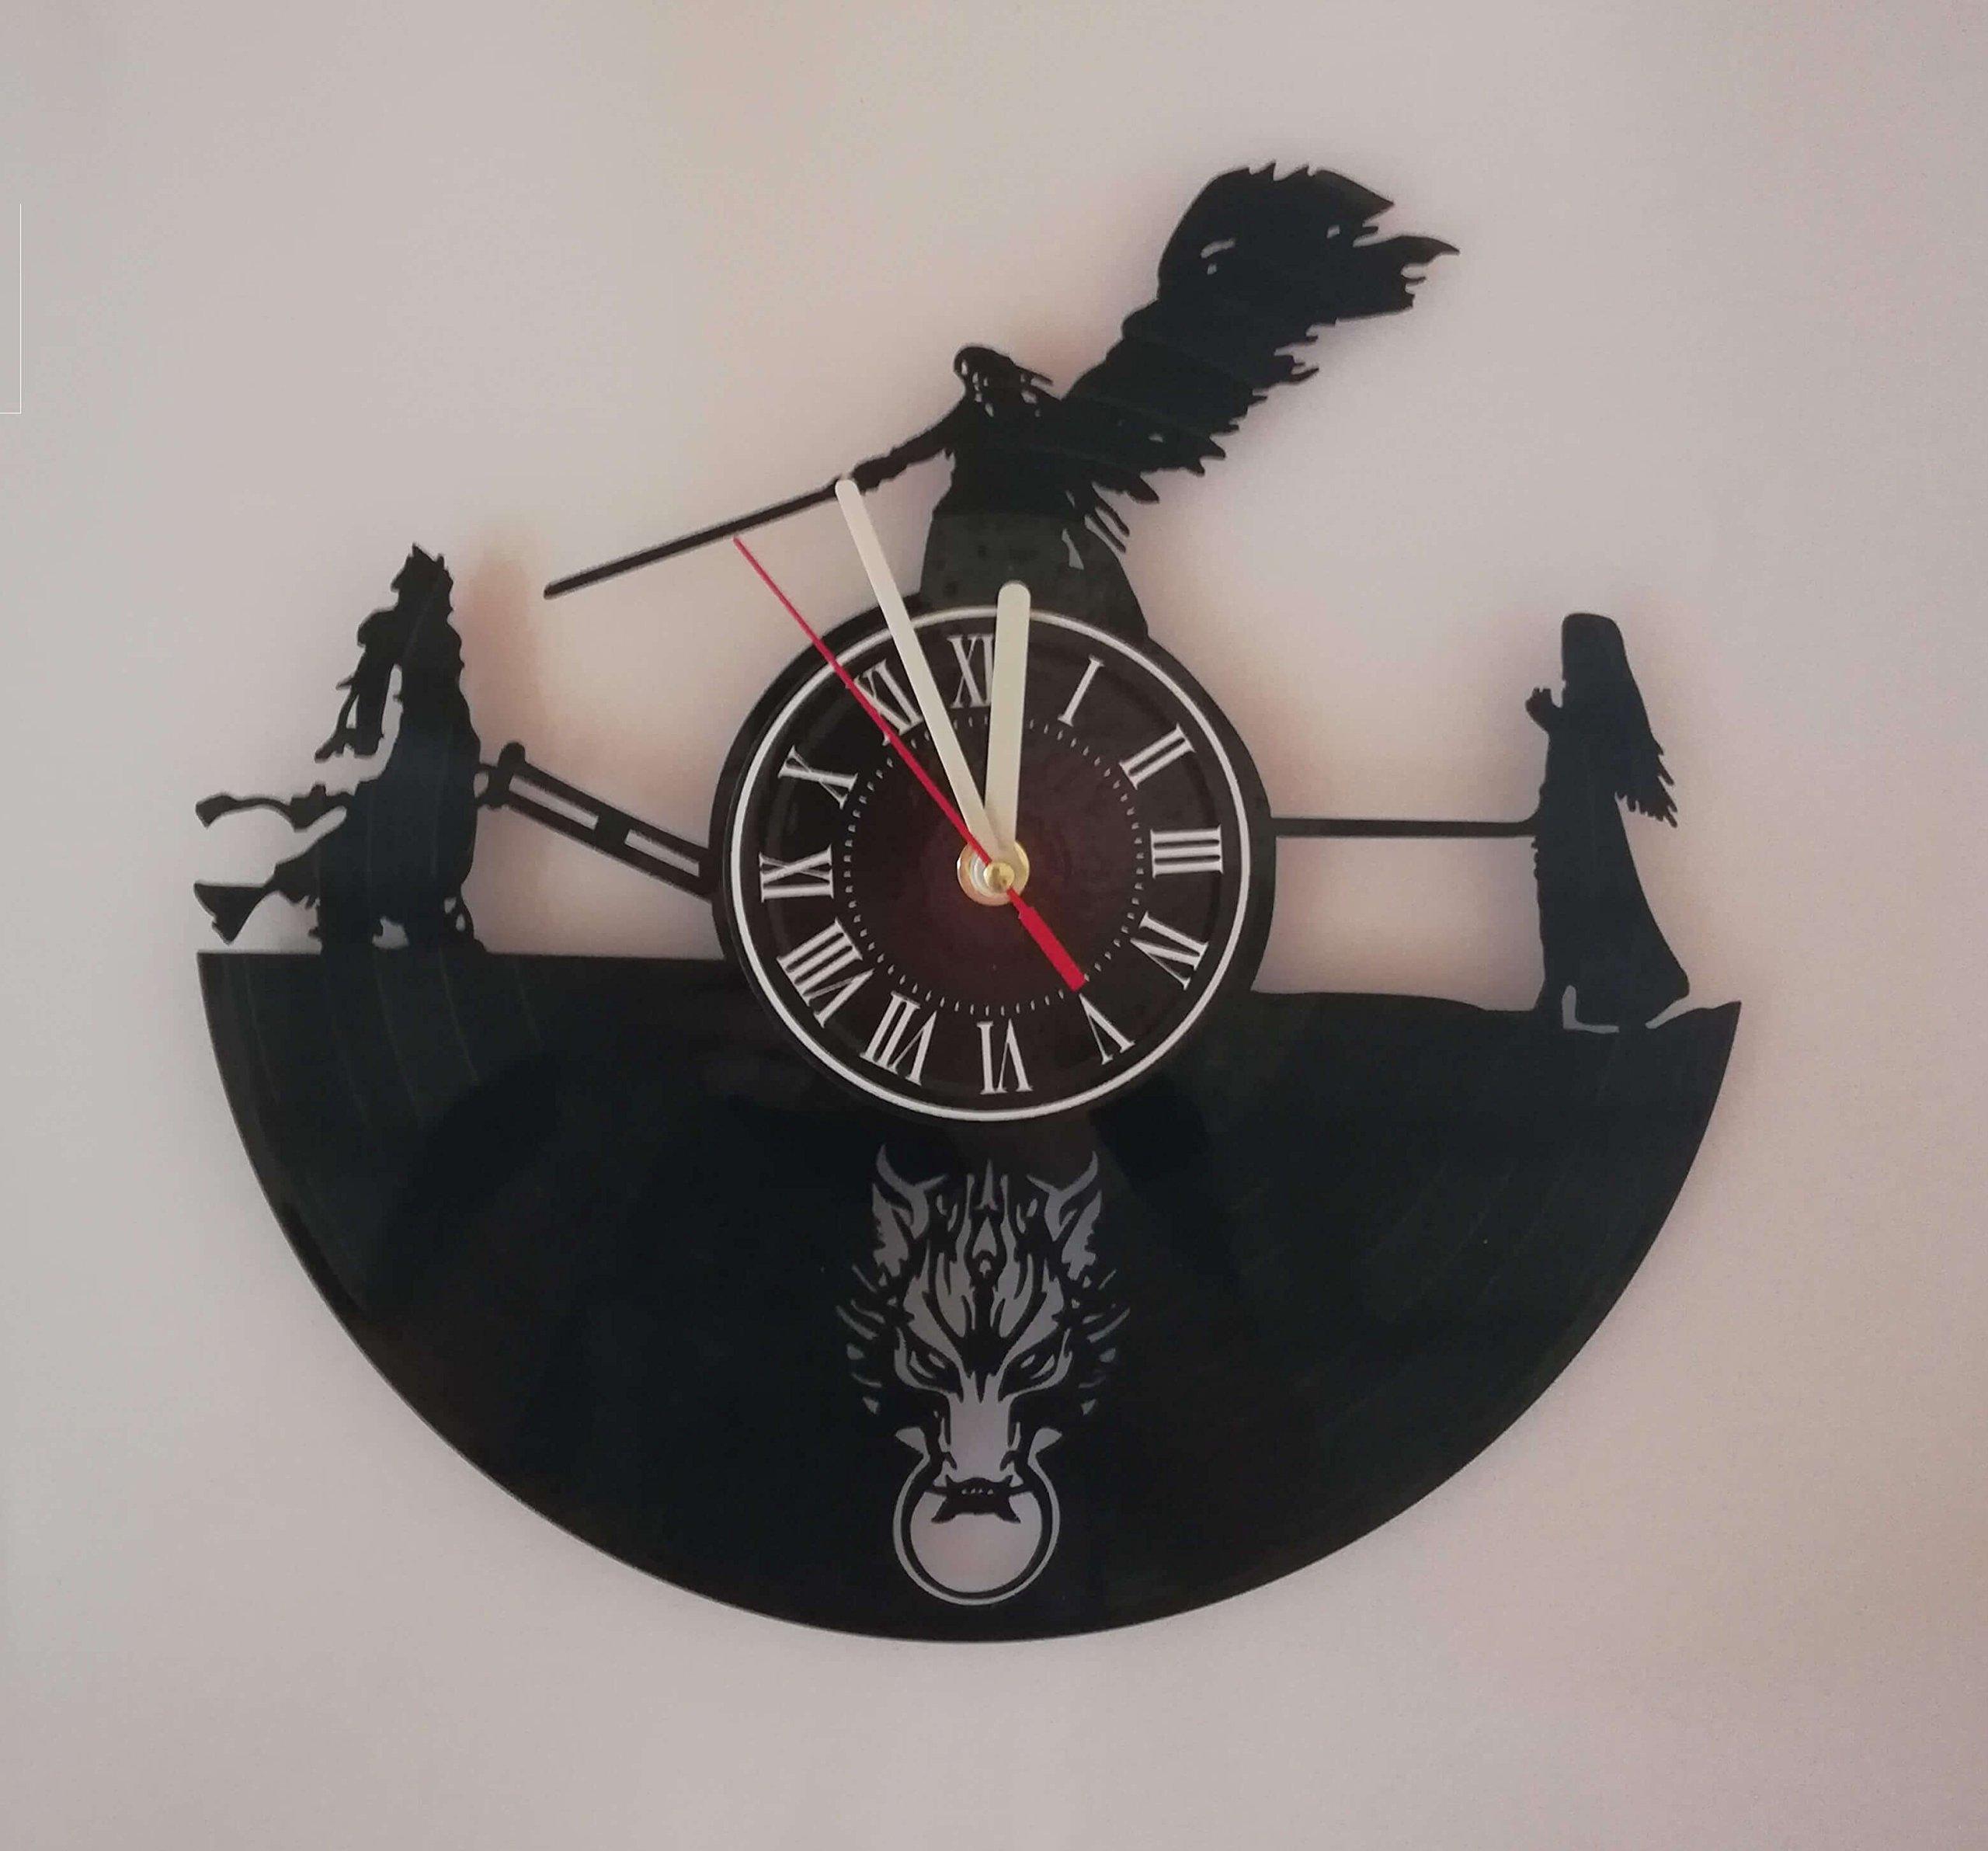 Final Fantasy VIVI 7 Handmade Vinyl Record Wall Clock - Adventure Anime PS PC Games room wall decor - Gift ideas for parents, teens – Epic Movie Unique Modern Art …